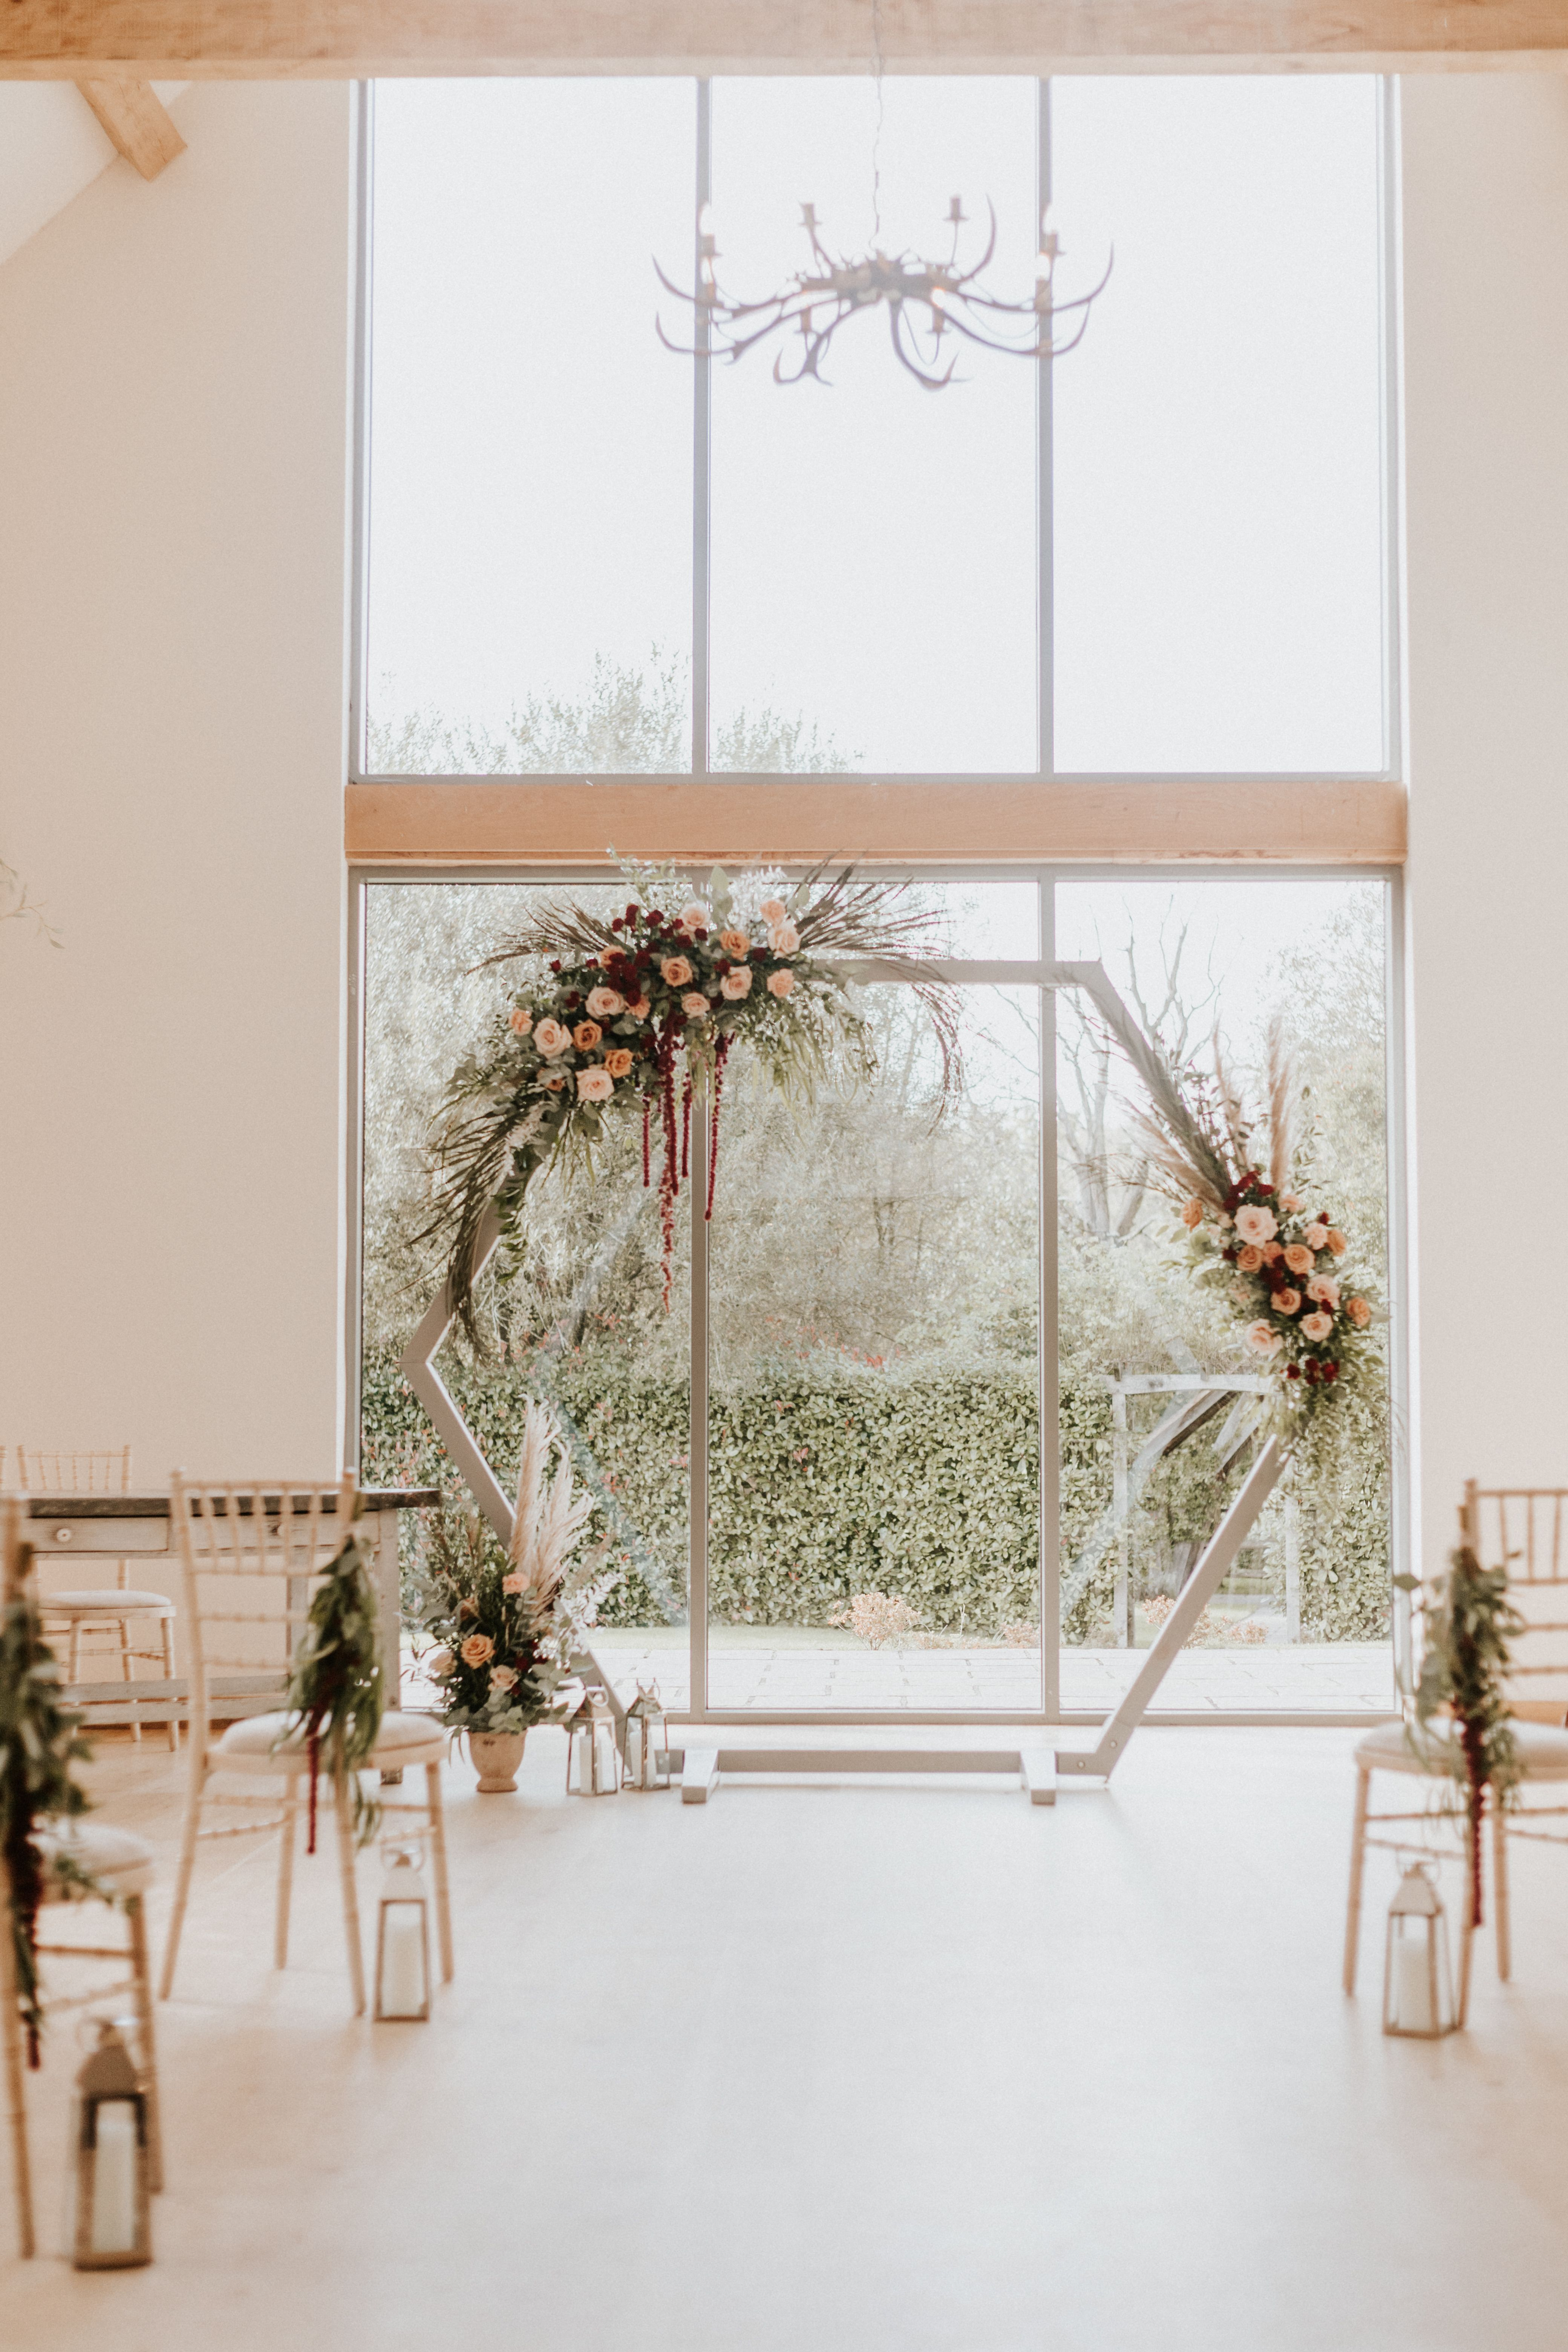 Millbridge Court, Exclusive Use Wedding Barn Venue, Surrey